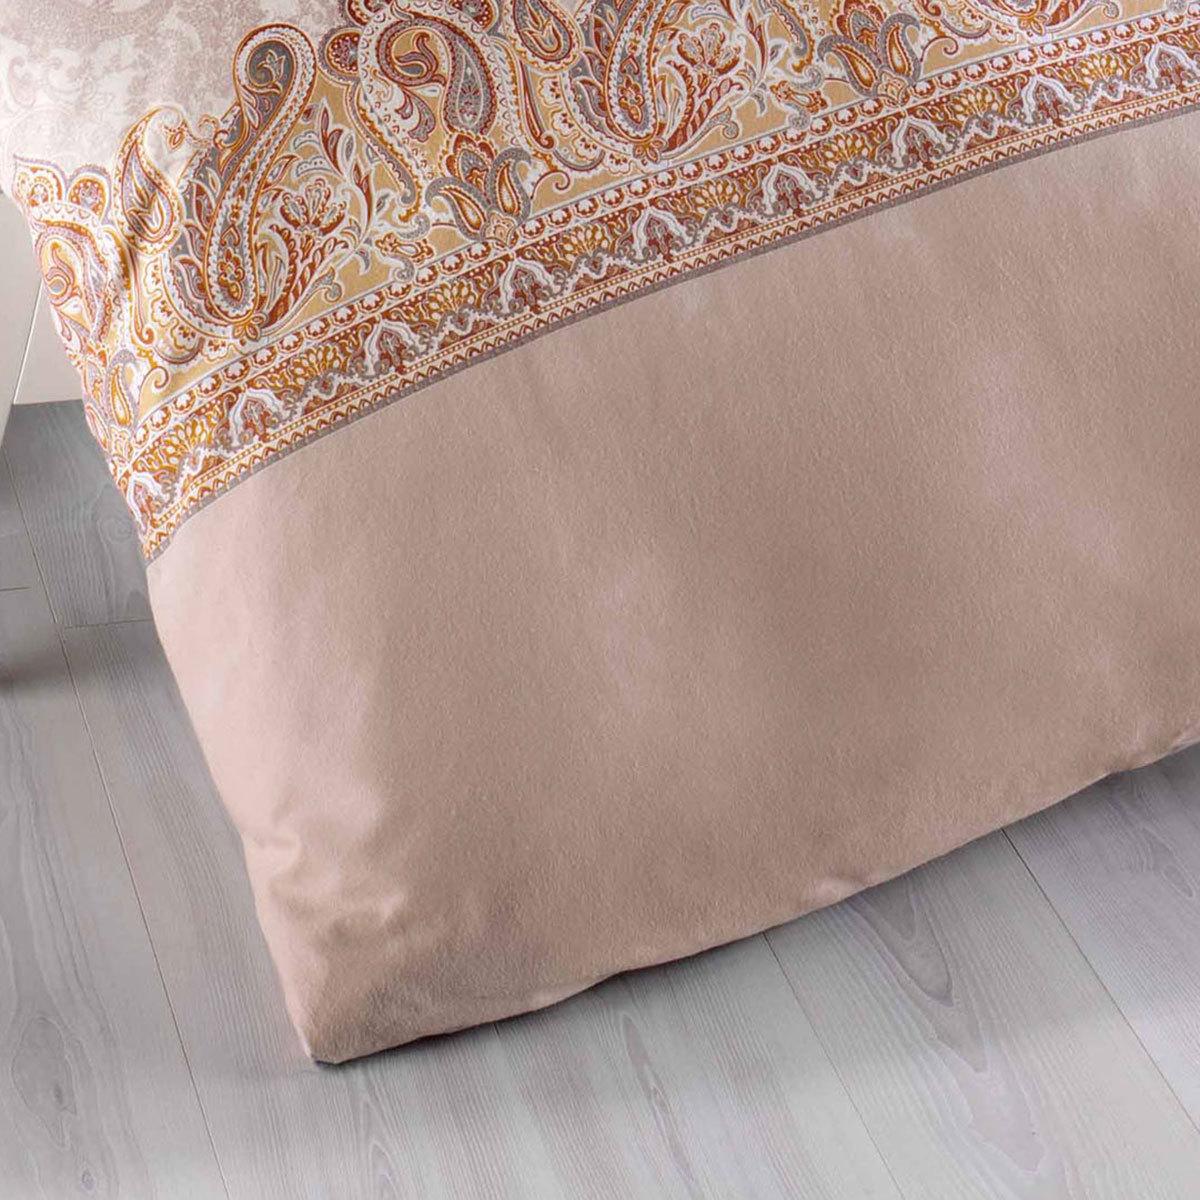 kaeppel biber bettw sche persis natur g nstig online kaufen bei bettwaren shop. Black Bedroom Furniture Sets. Home Design Ideas